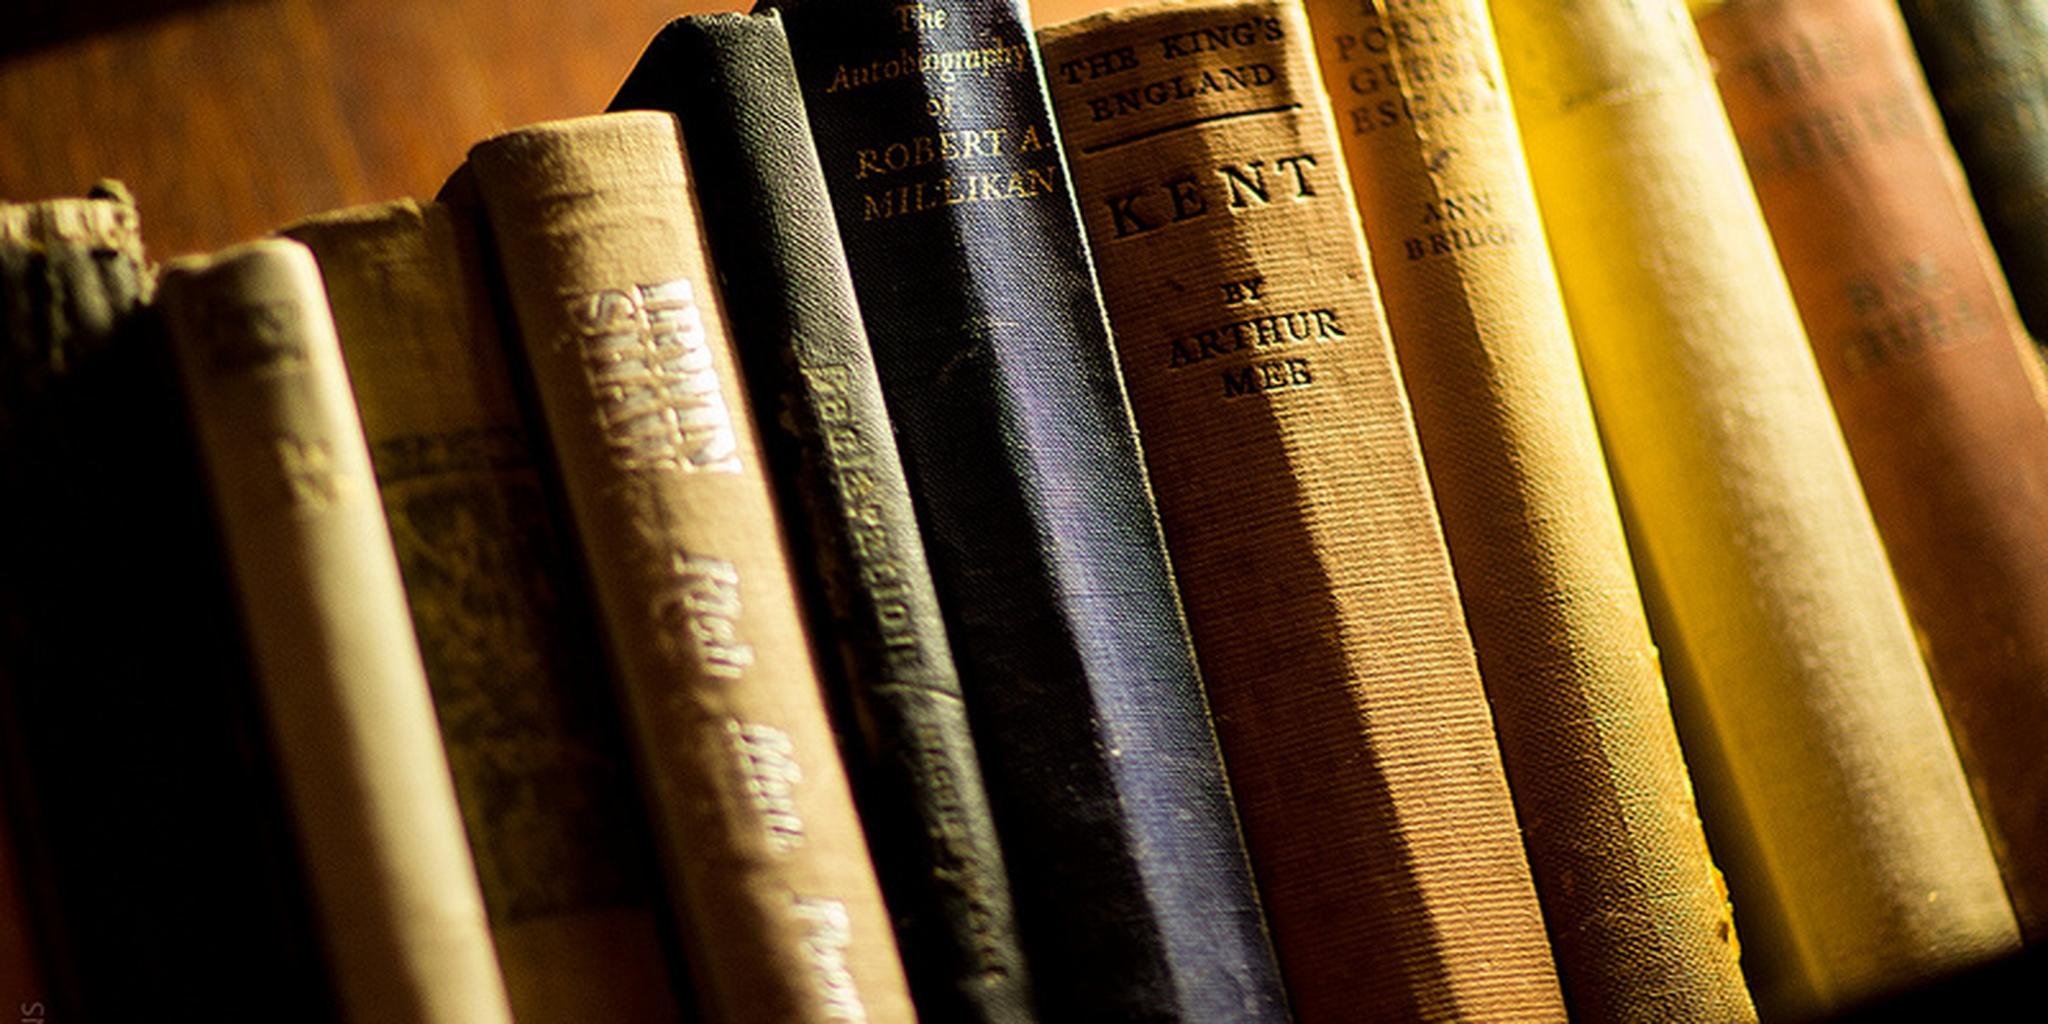 Books!   Flickr - Photo Sharing!